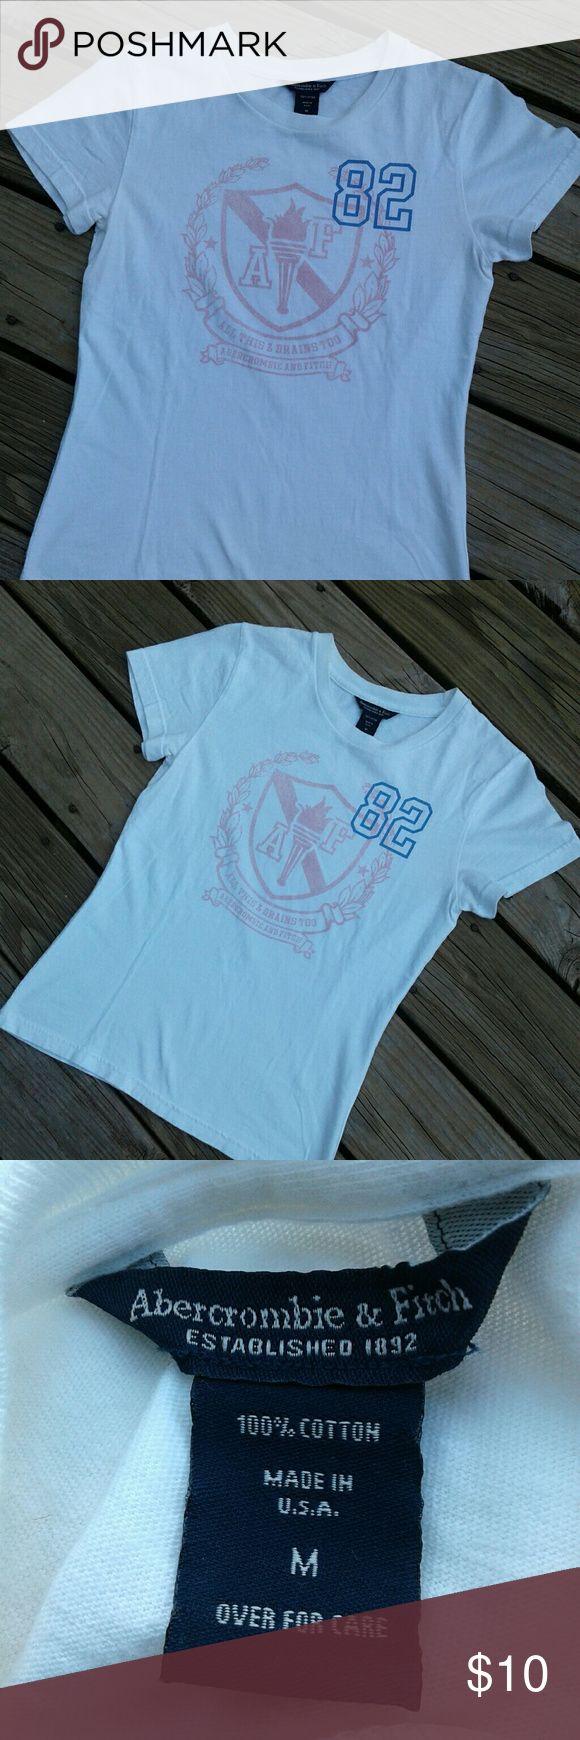 T shirt design jonesboro ar - Abercrombie And Fitch Shirt